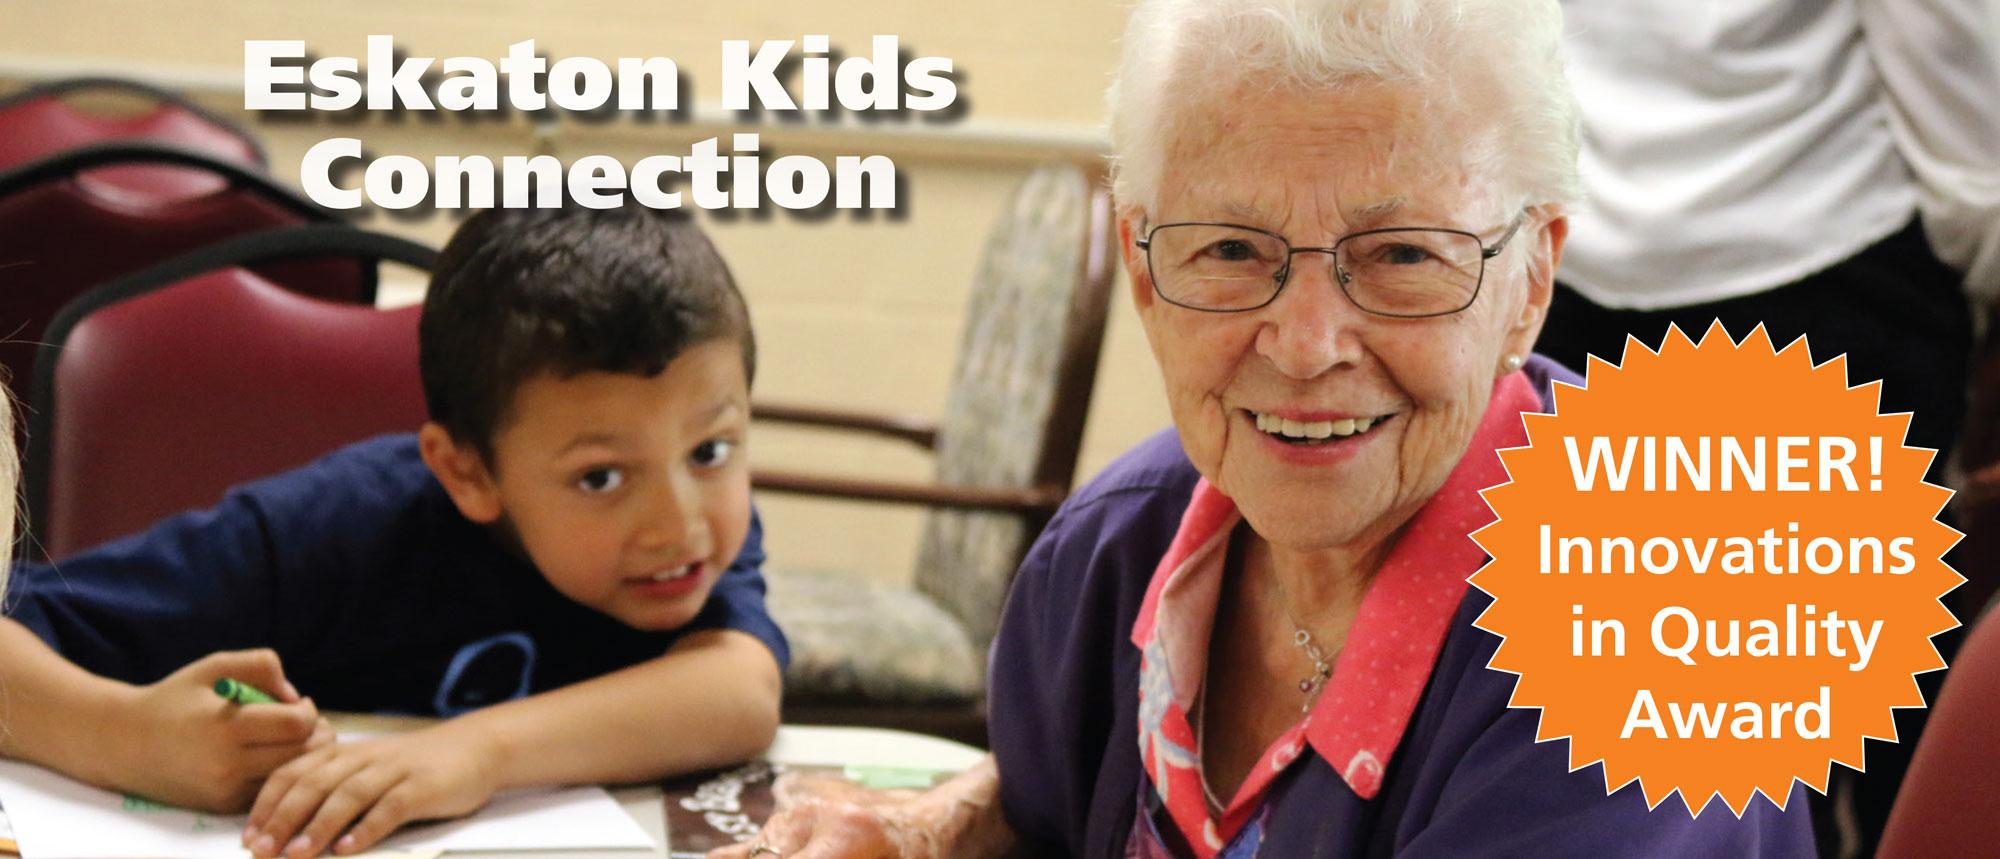 Eskaton-Kids-Connection-CALA Winner 2015